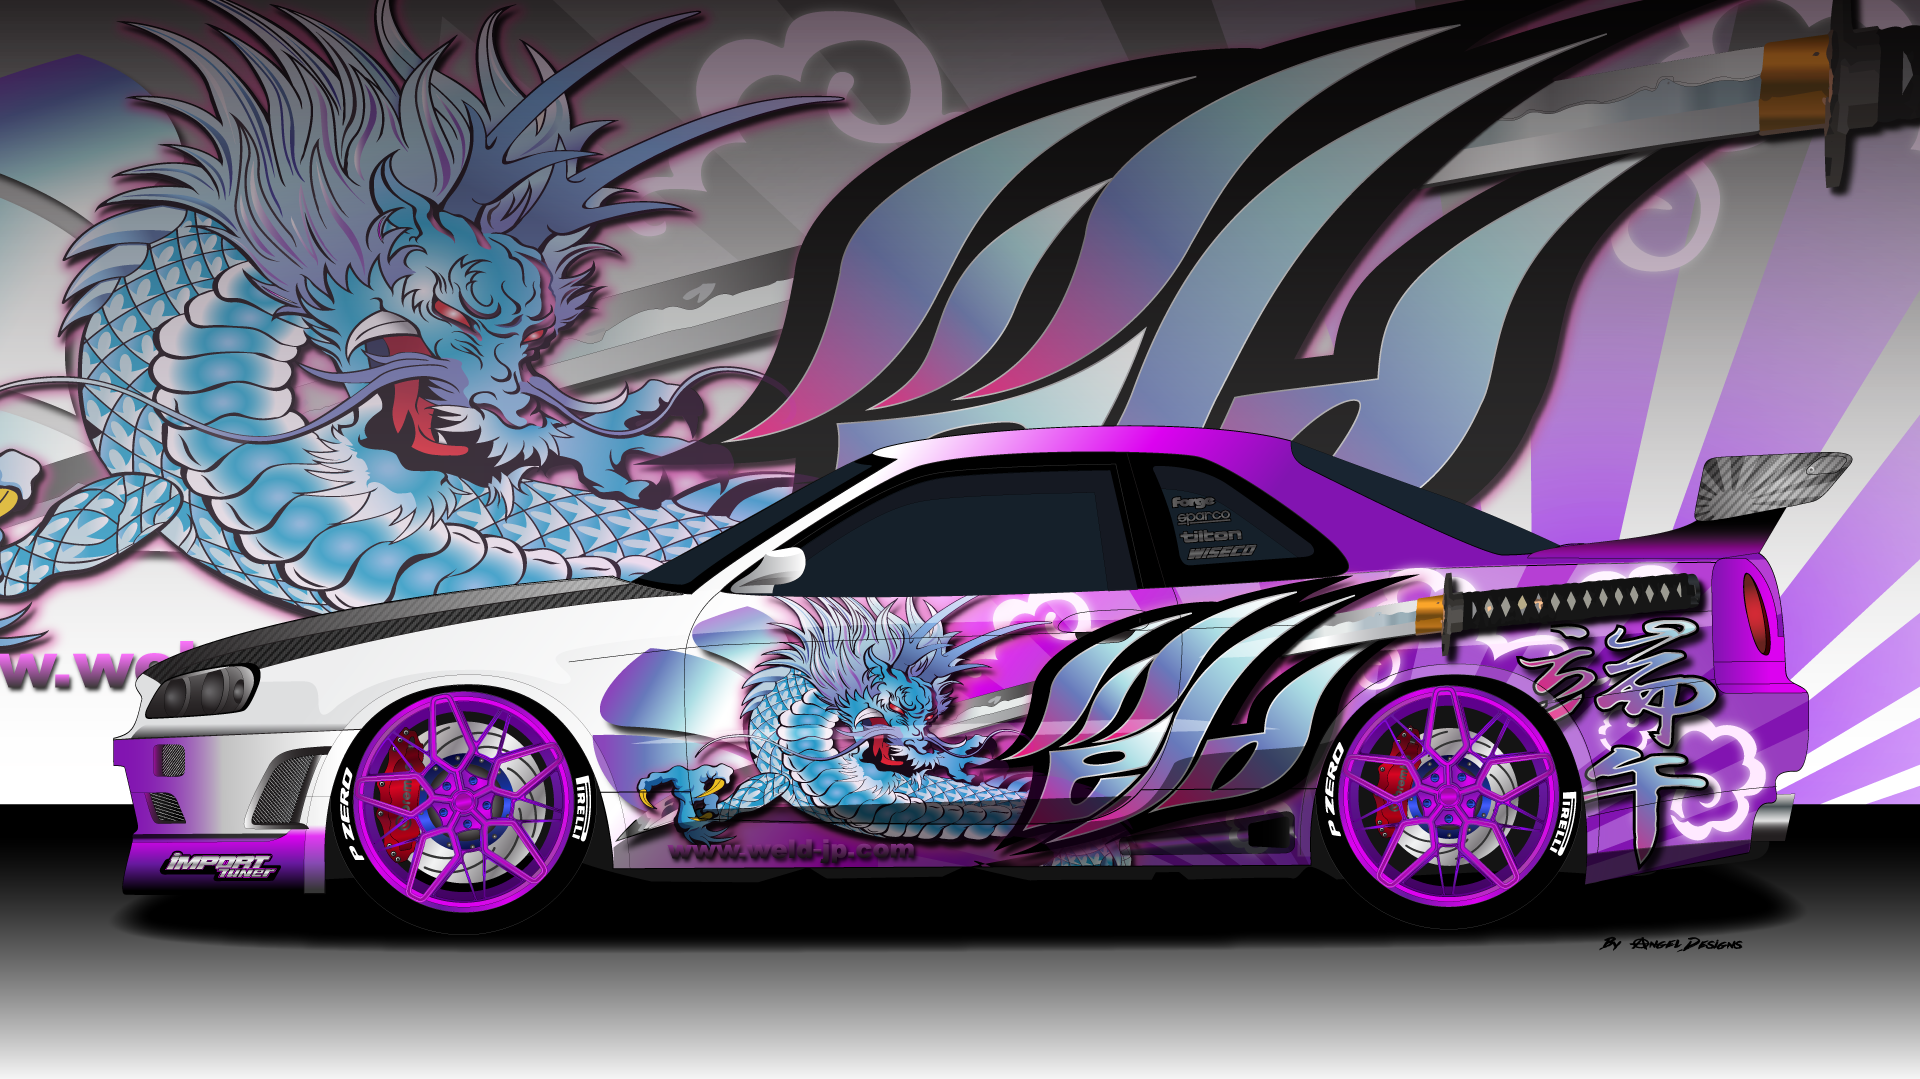 Nissan gtr r34 weld dragon gtr skylinegtr r34